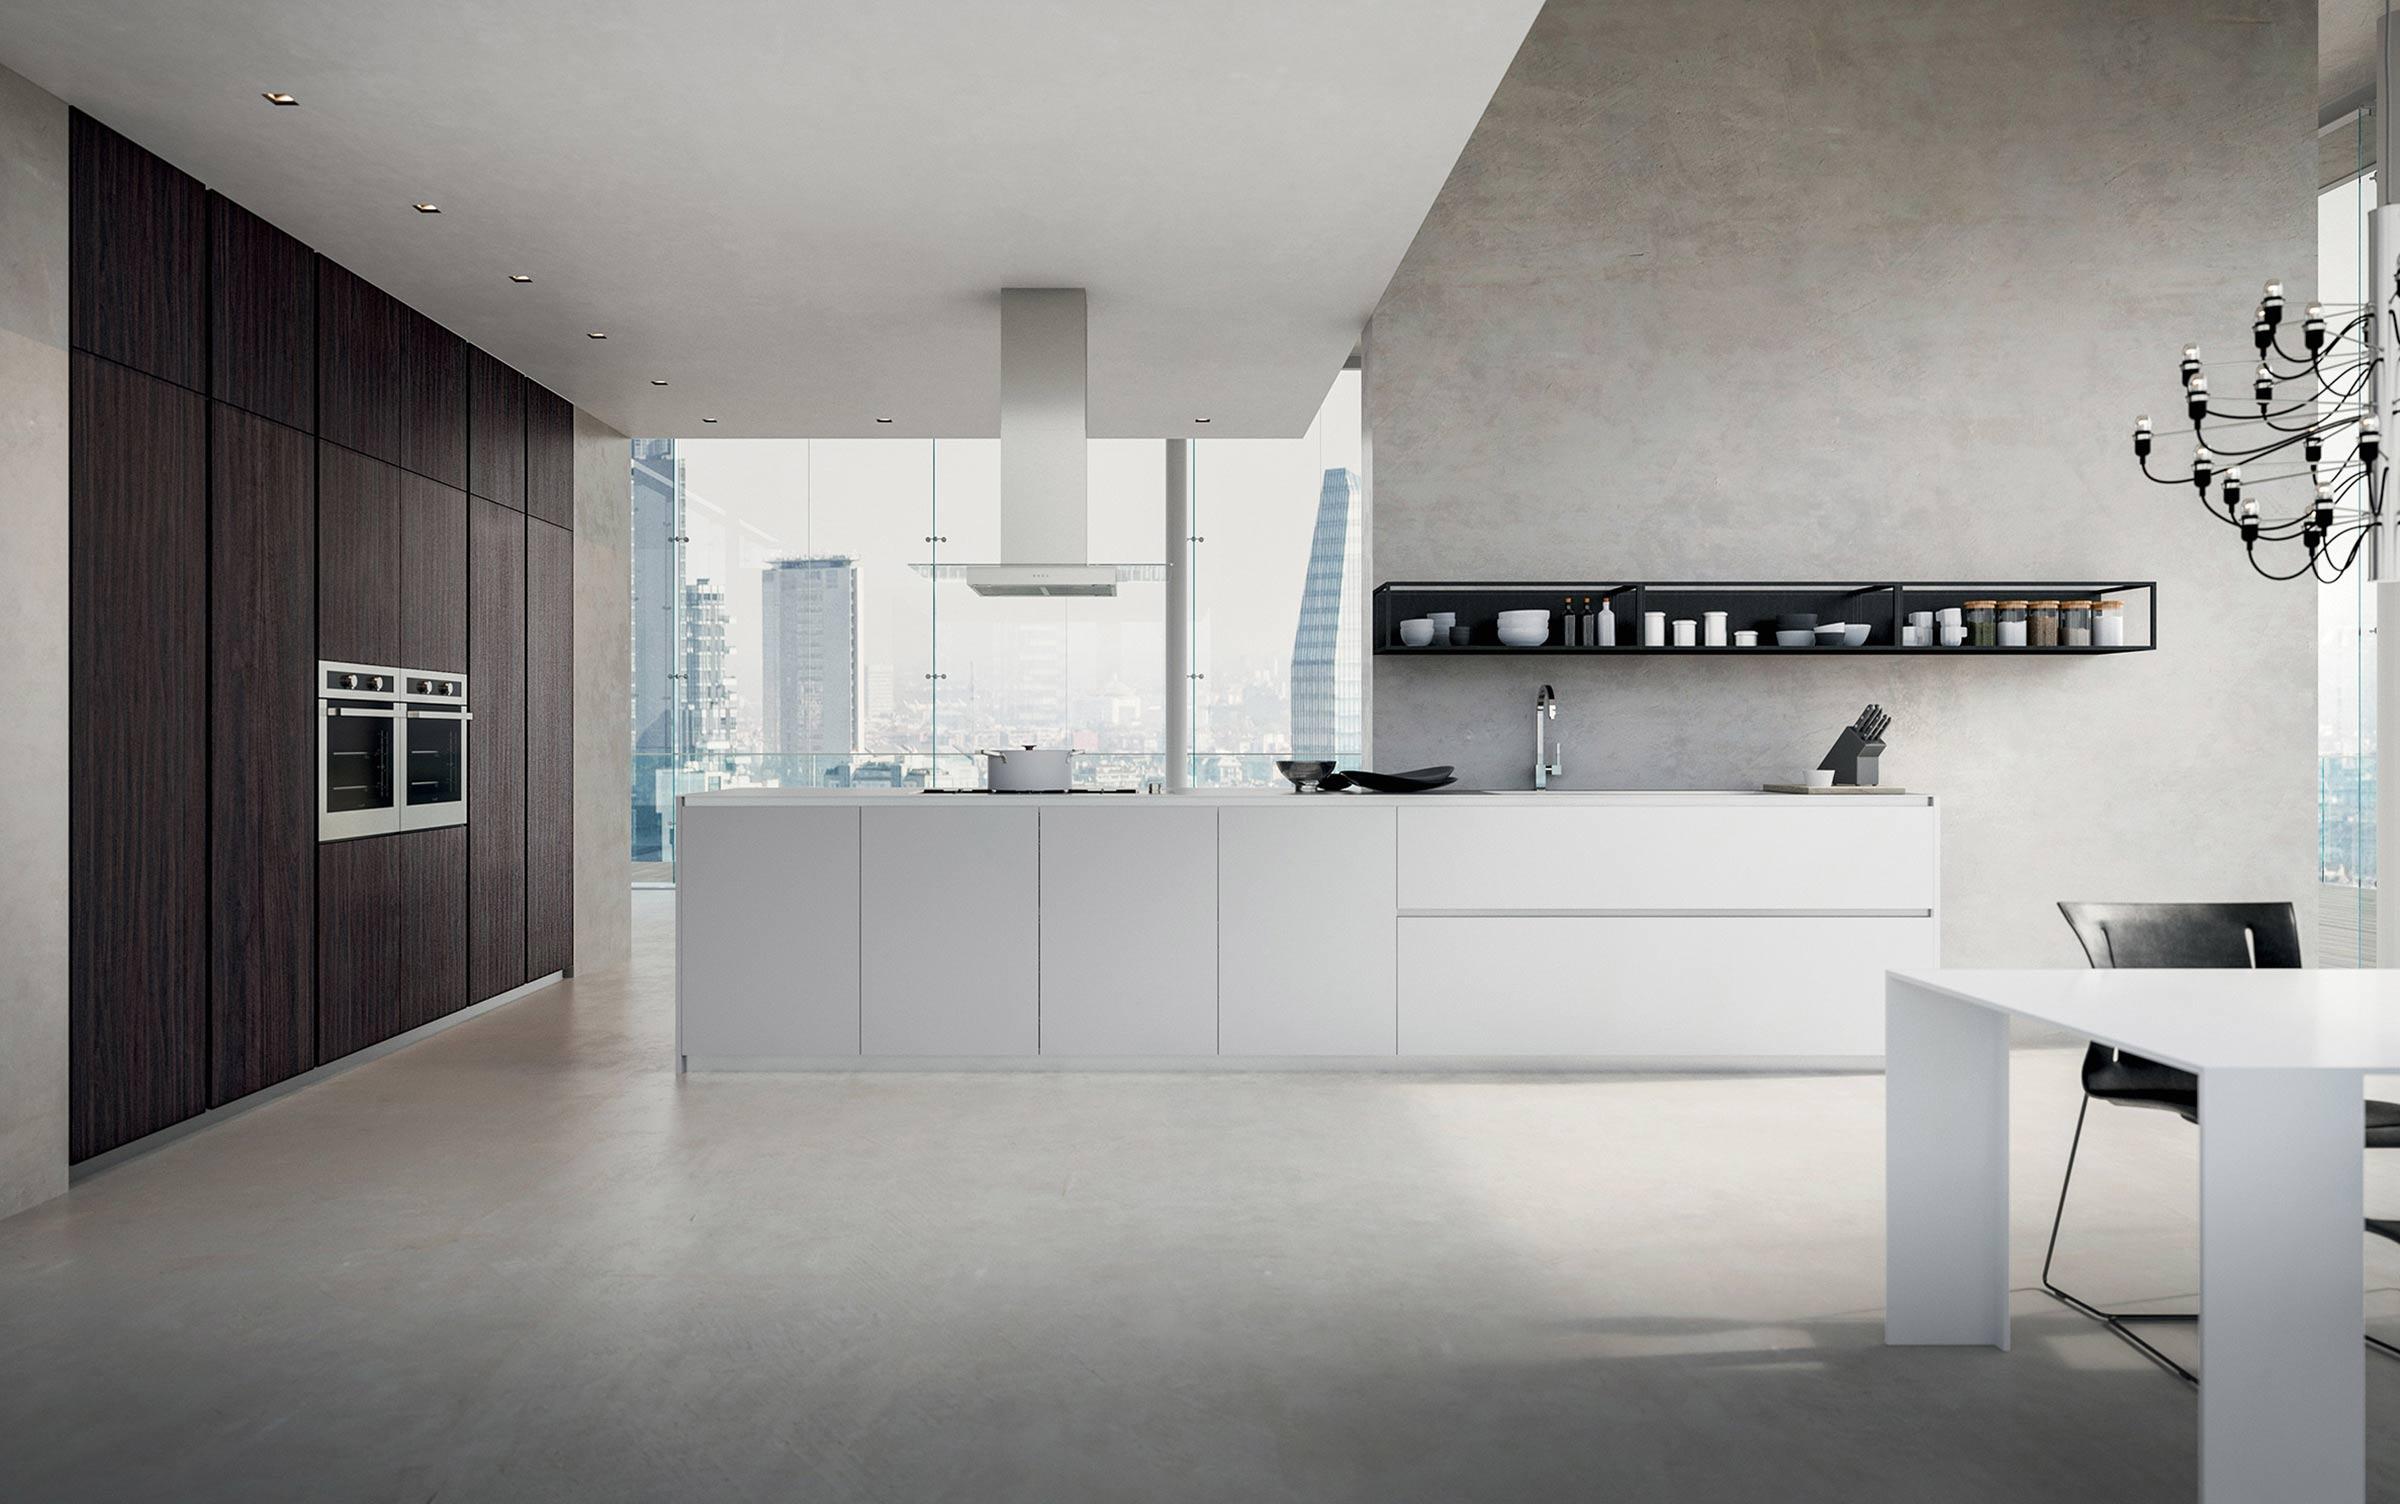 cuisines design lyon les cuisines d arno. Black Bedroom Furniture Sets. Home Design Ideas